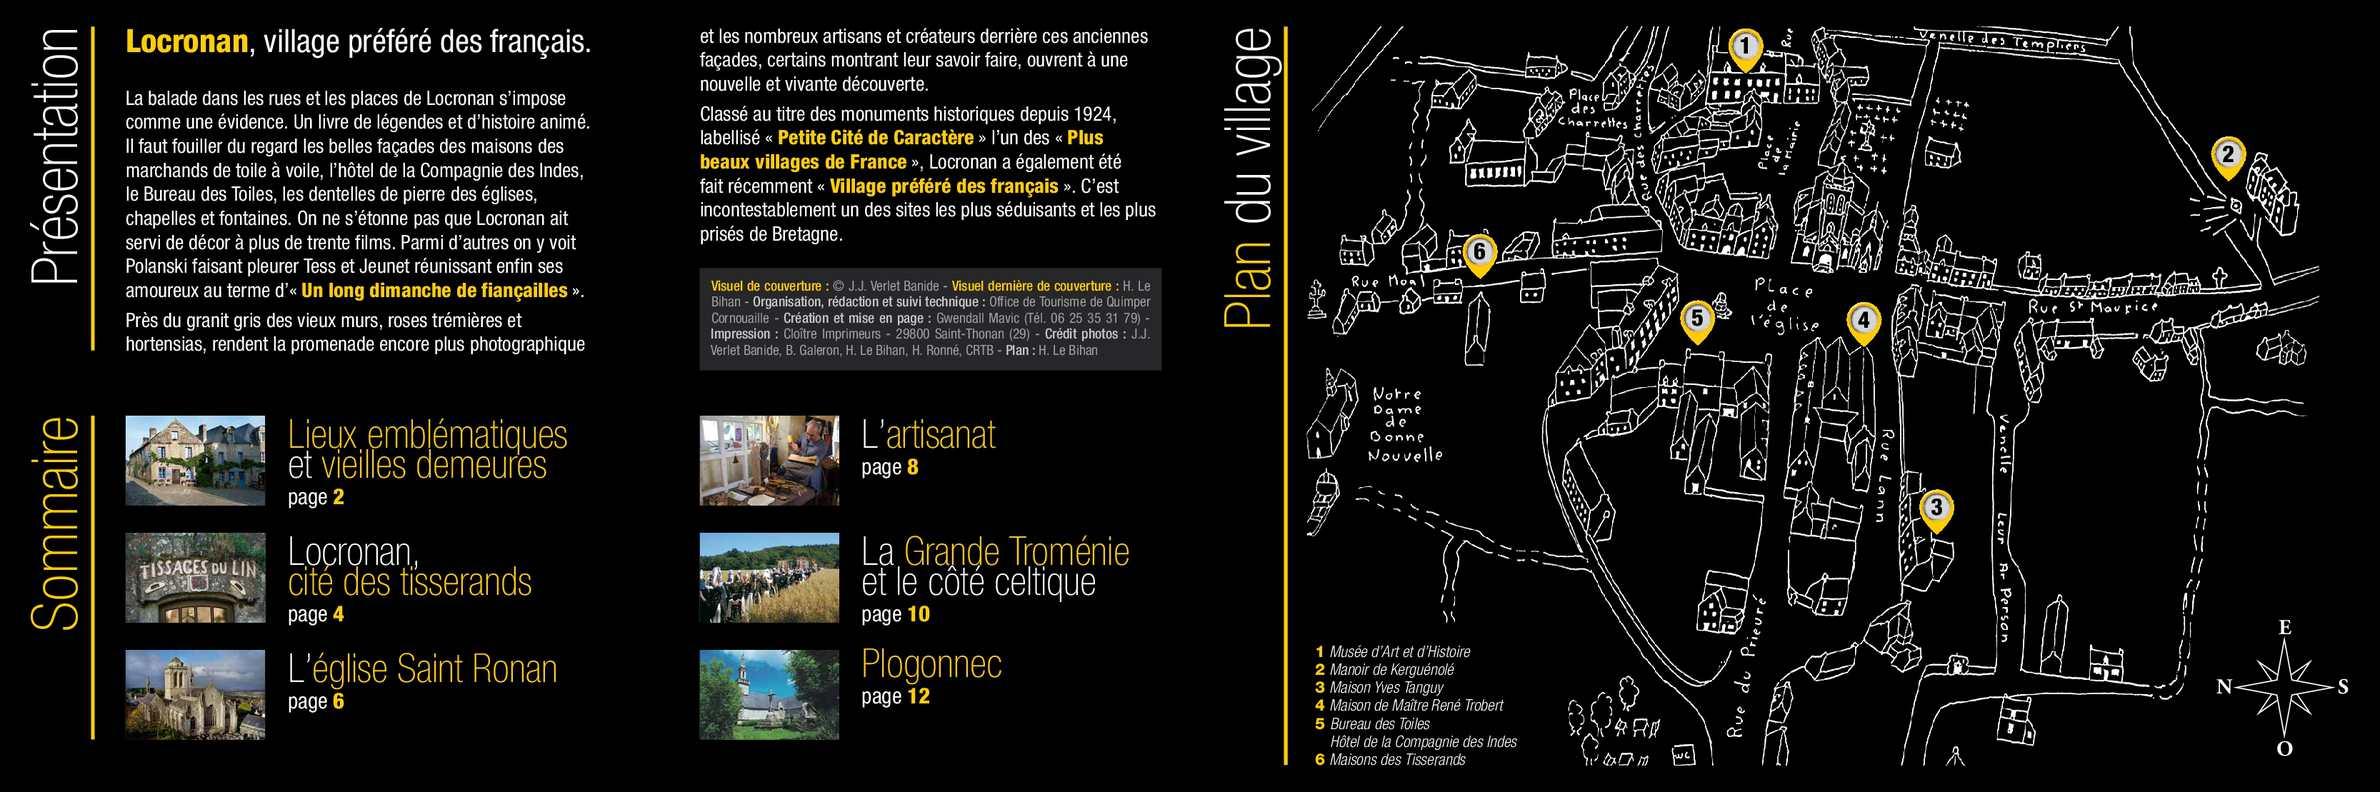 Circuit Découverte De Locronan Calameo Downloader